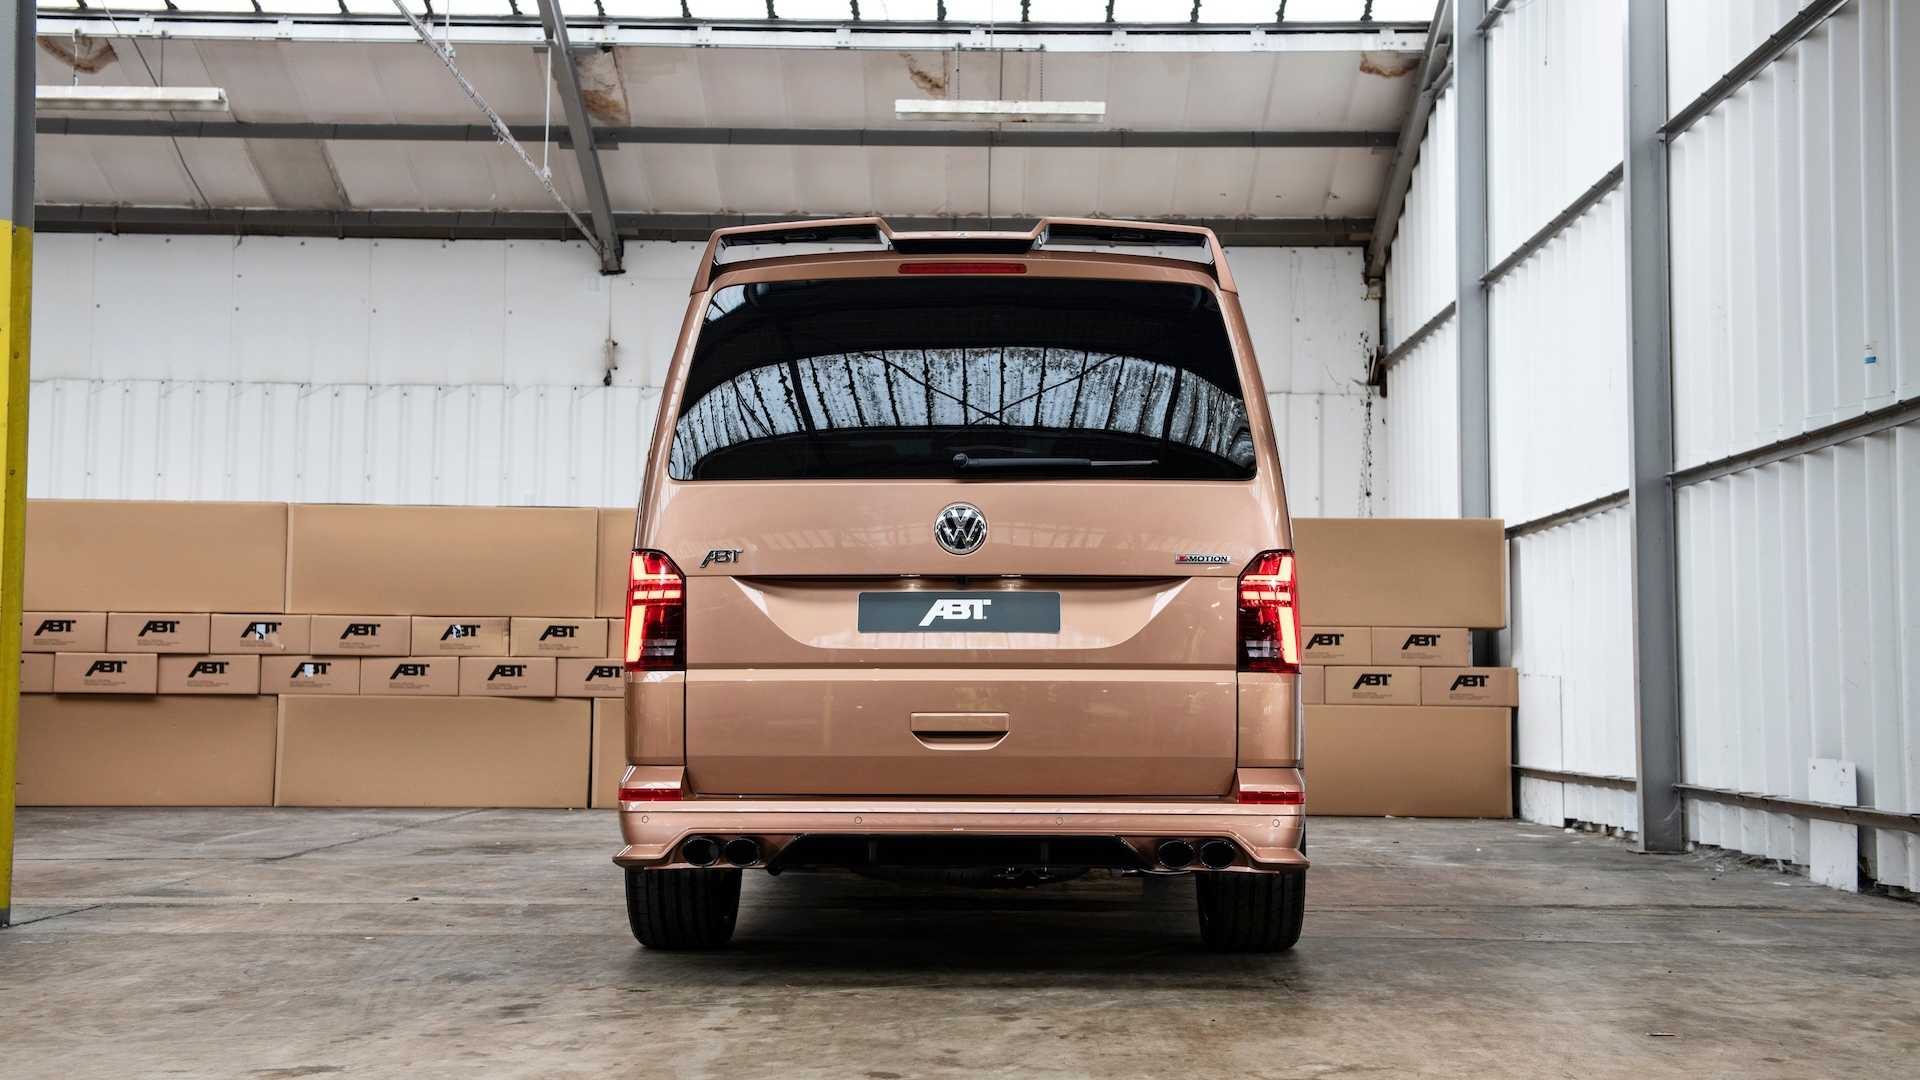 VW-Transporter-by-ABT-10